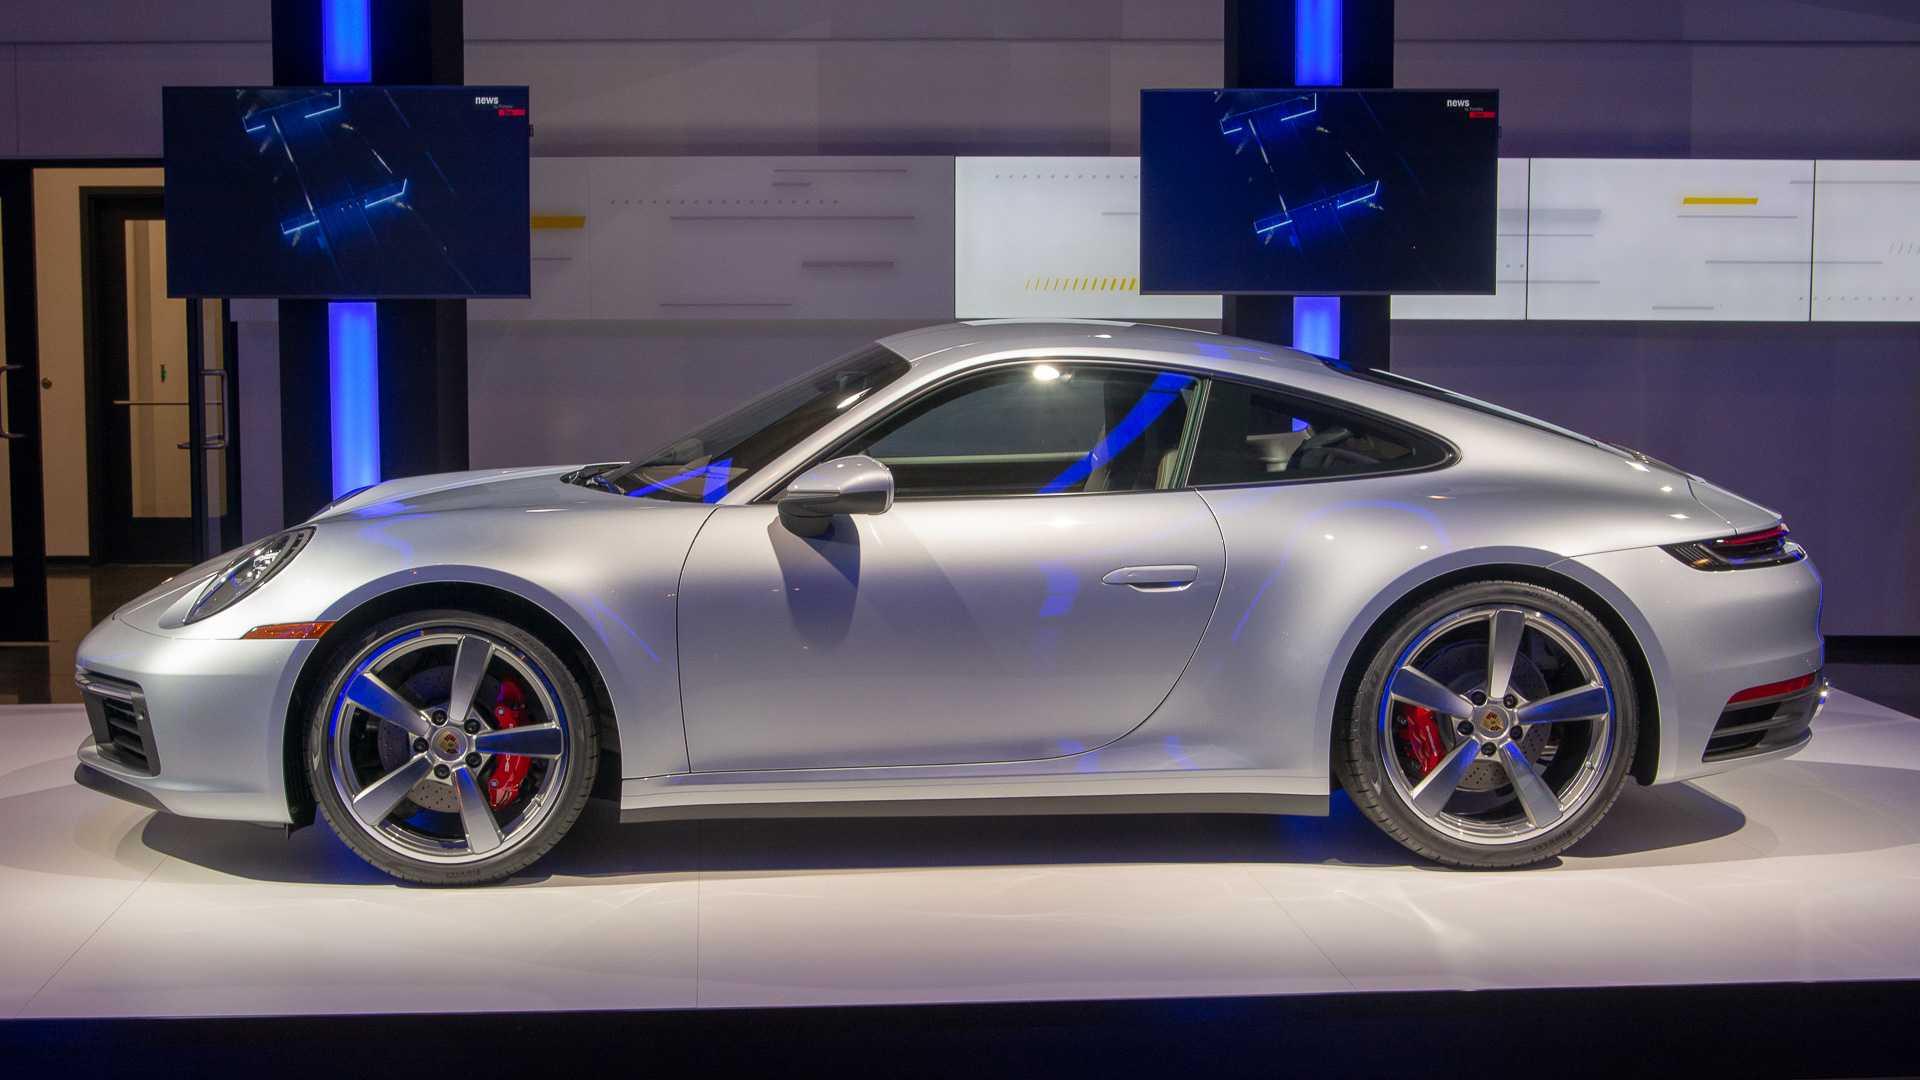 2020-porsche-911-carrera-s-2.jpg